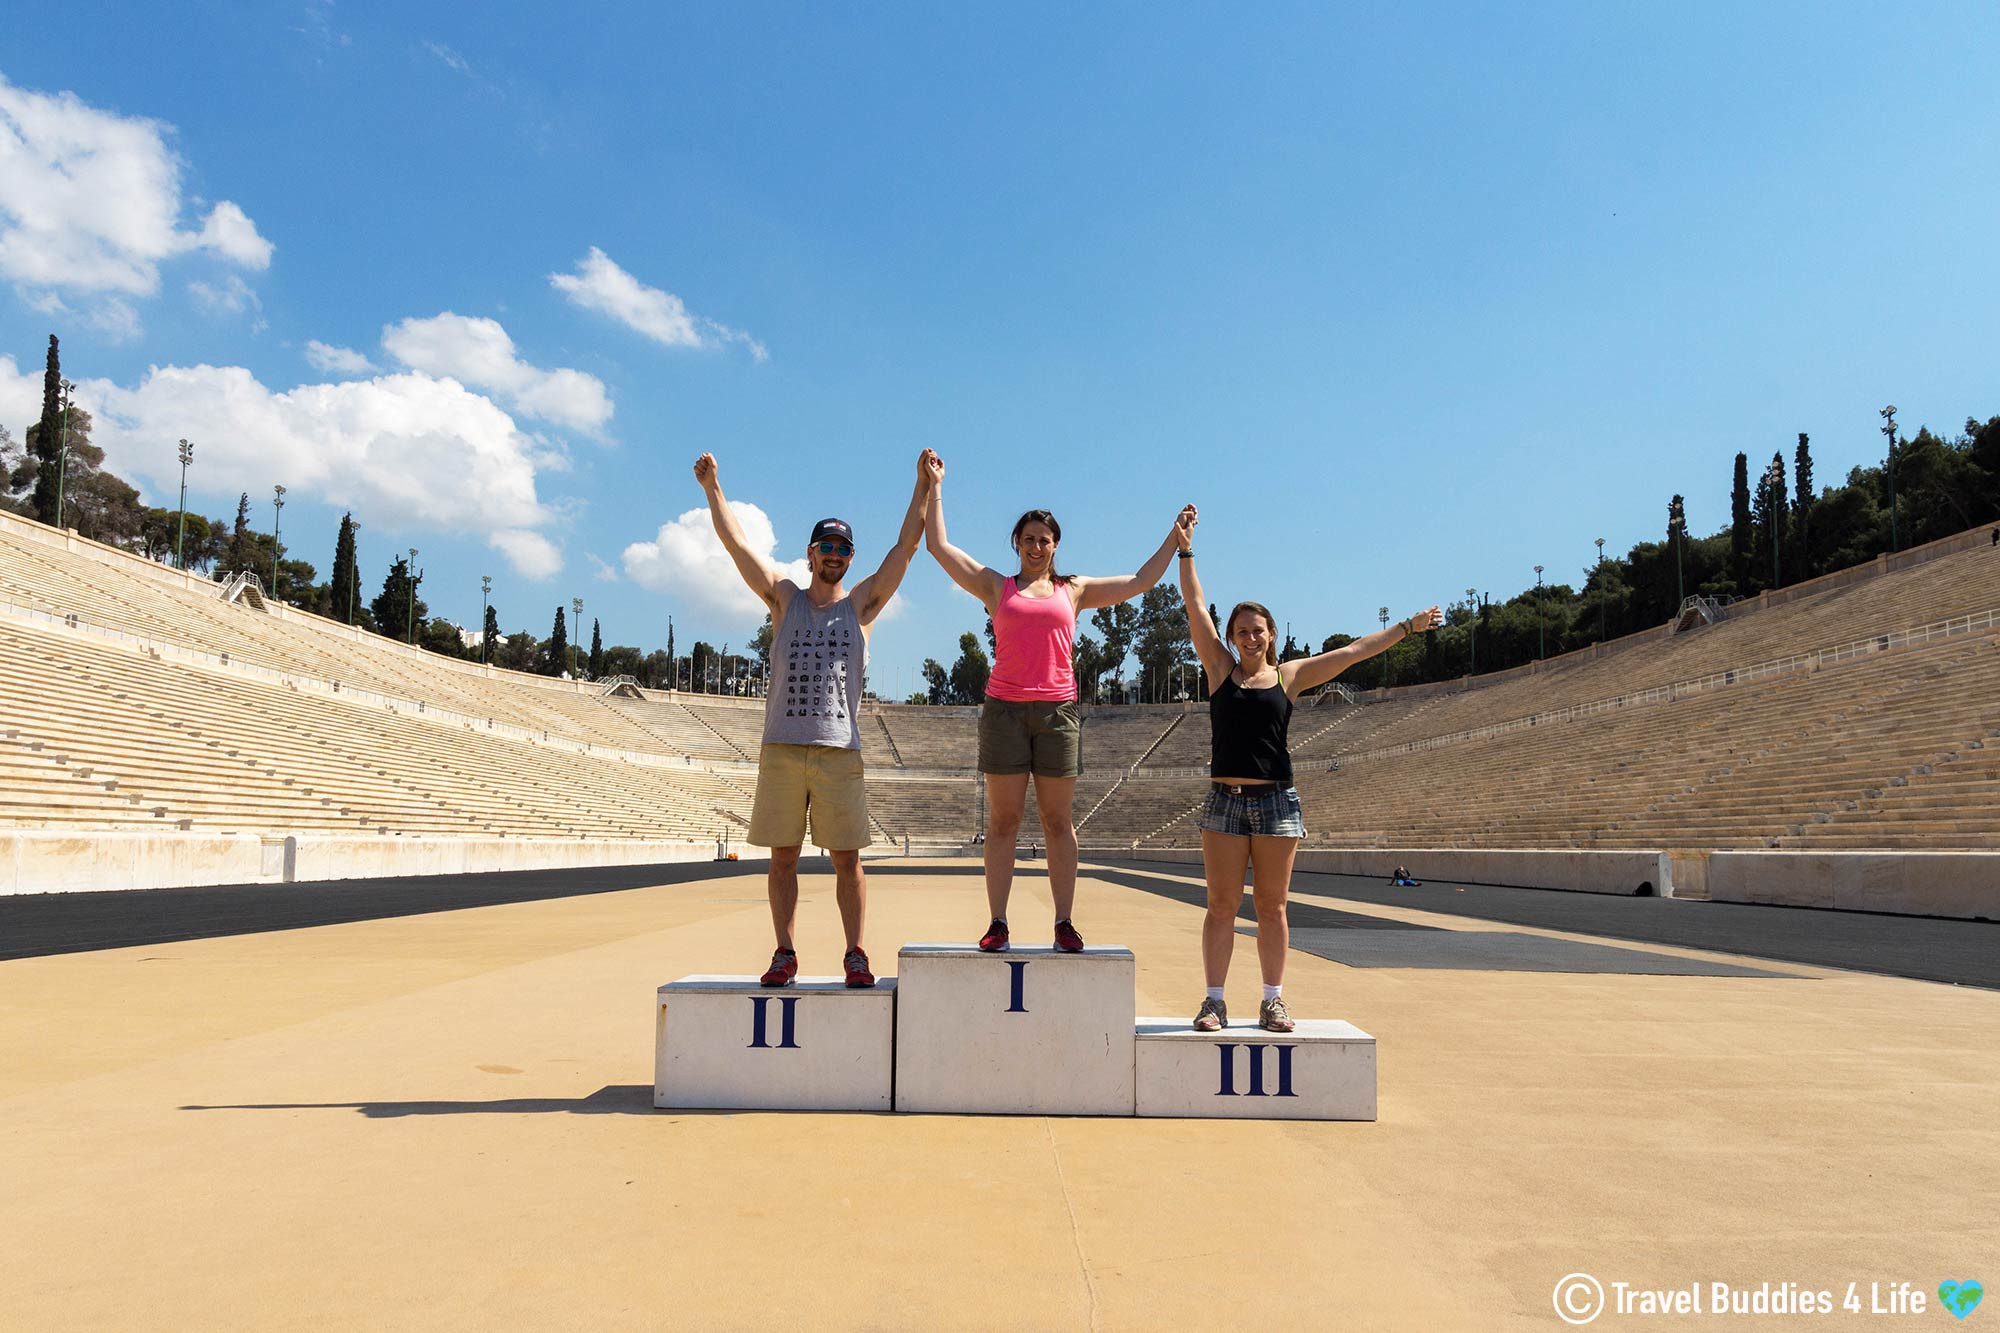 Nadine, Joey And Ali On The Podium Of The Panathenaic Stadium In Athens, Traveling Greece, Europe